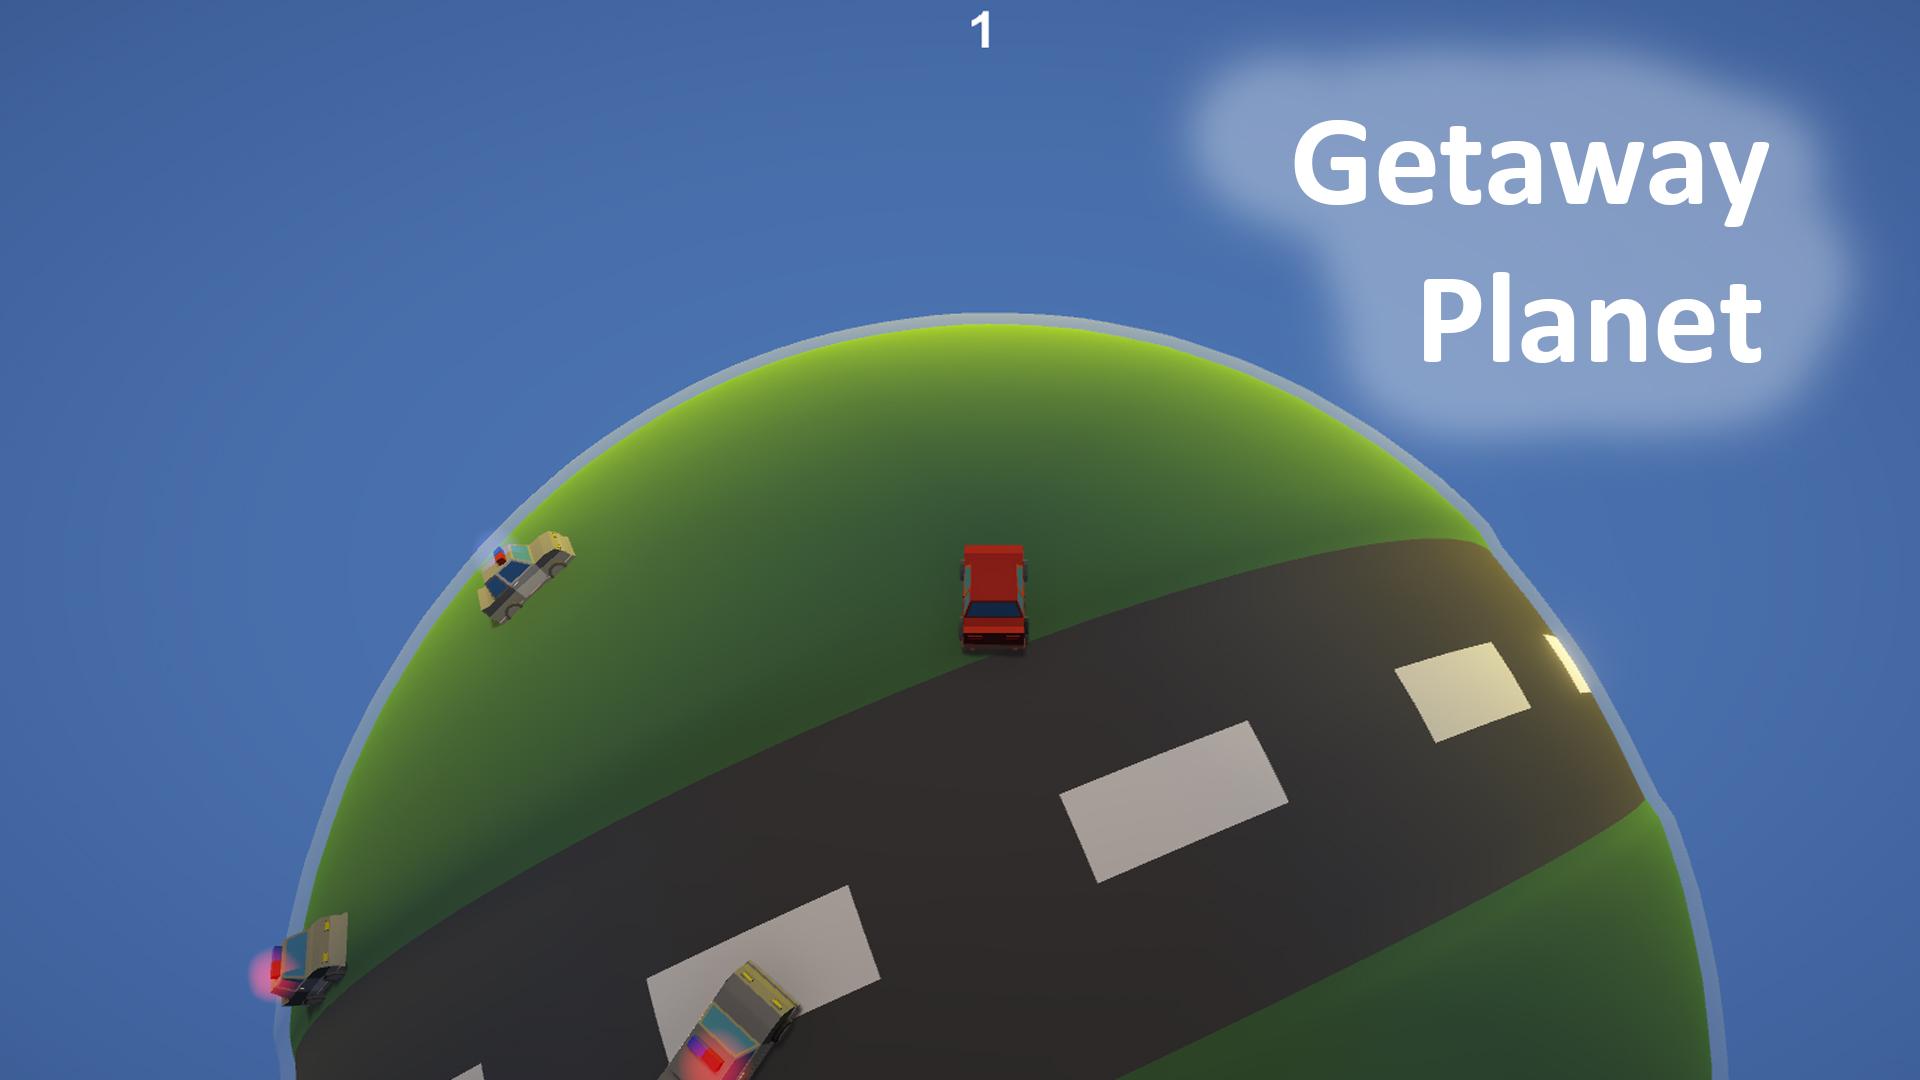 Getaway Planet